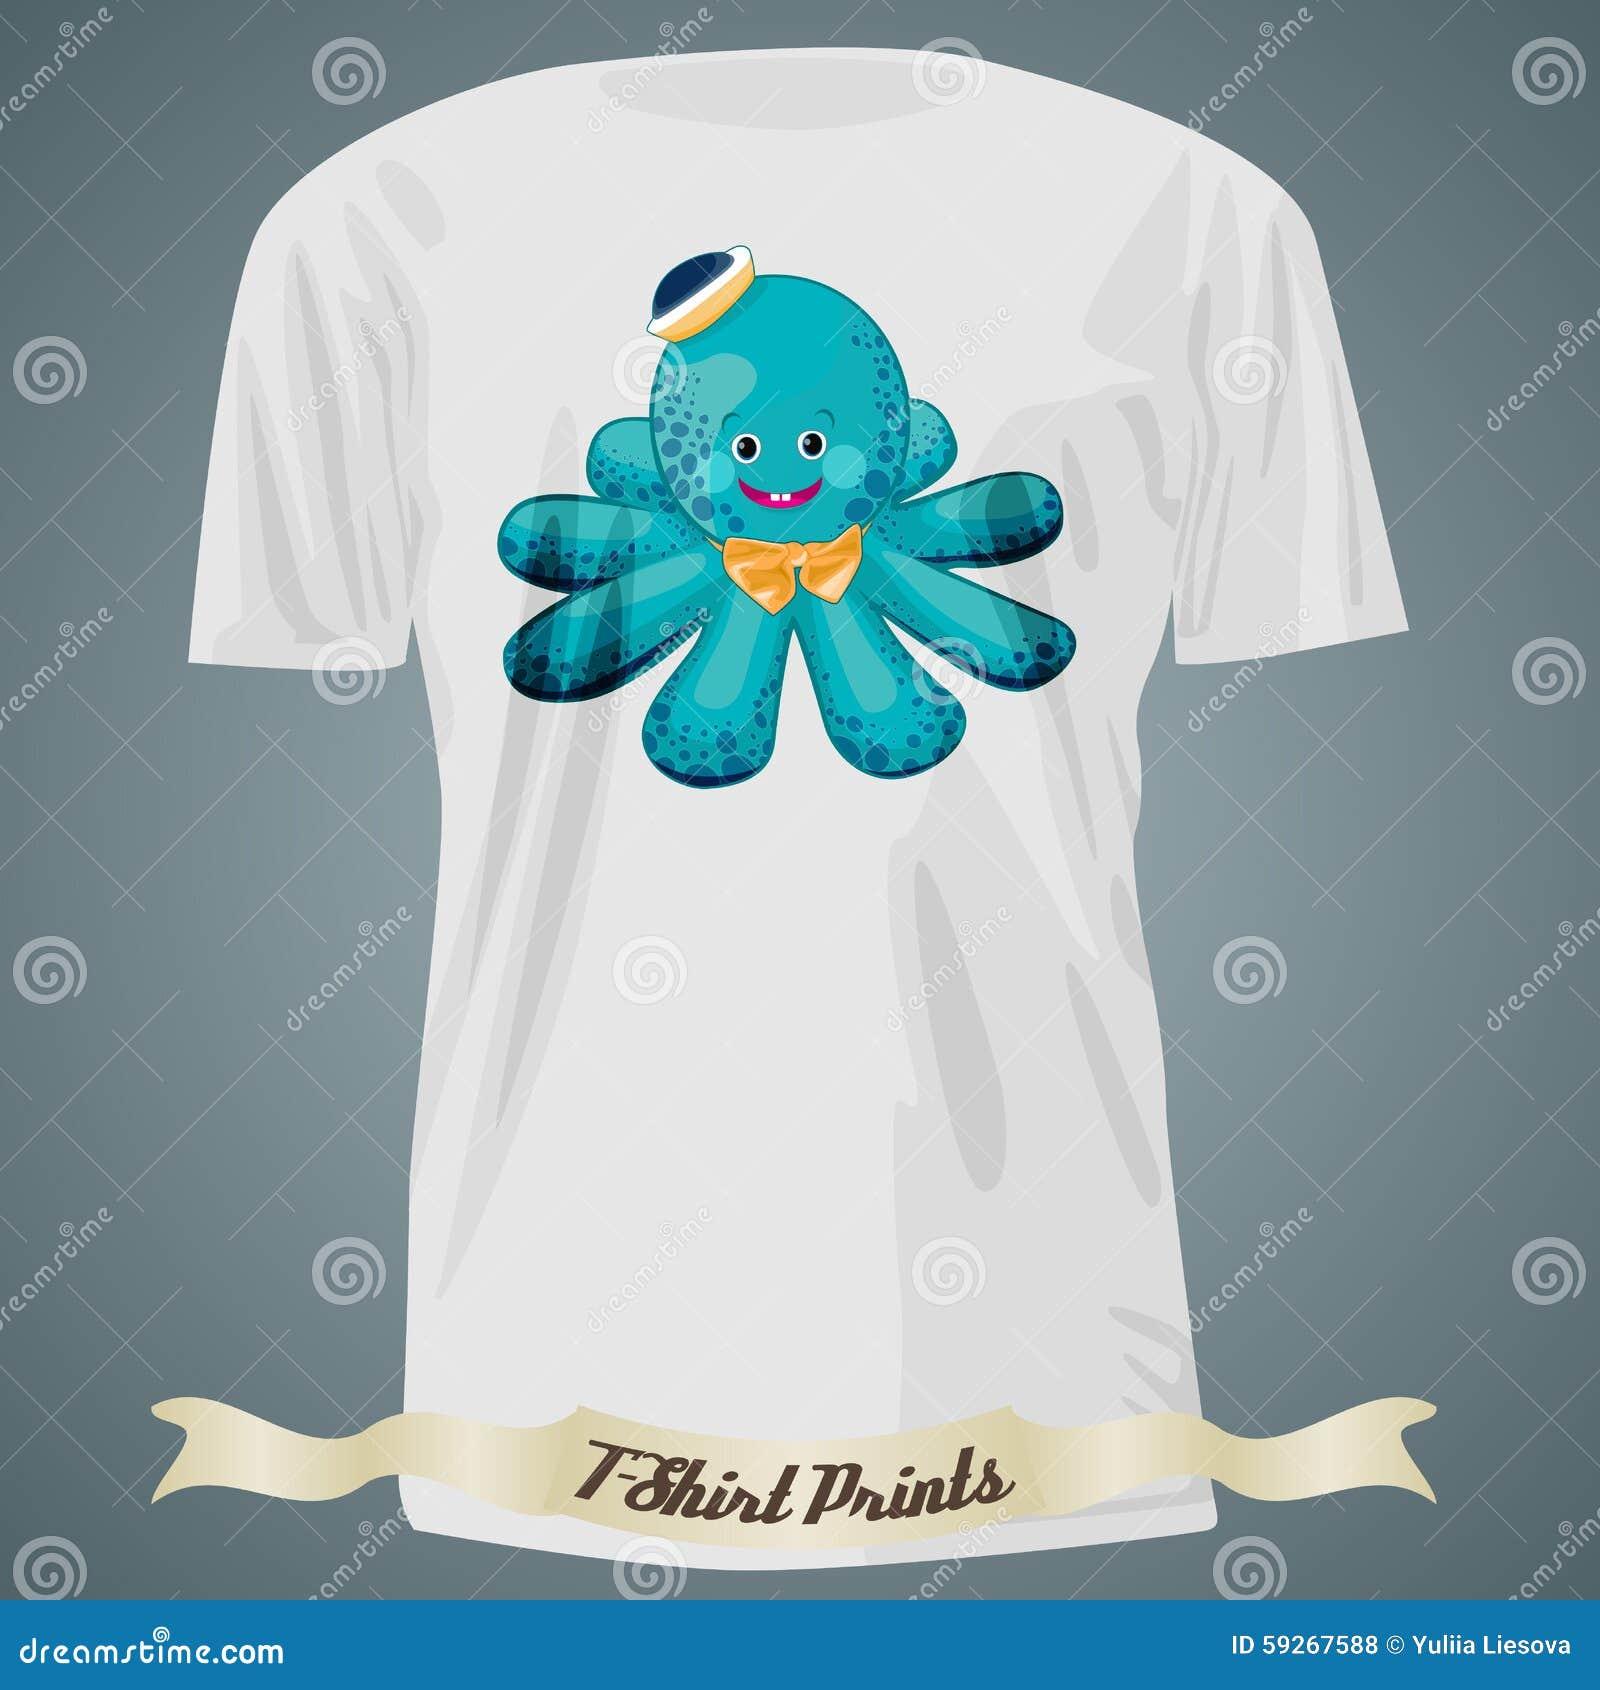 Shirt design octopus - T Shirt Design With Cartoon Of Baby Octopus In Hat